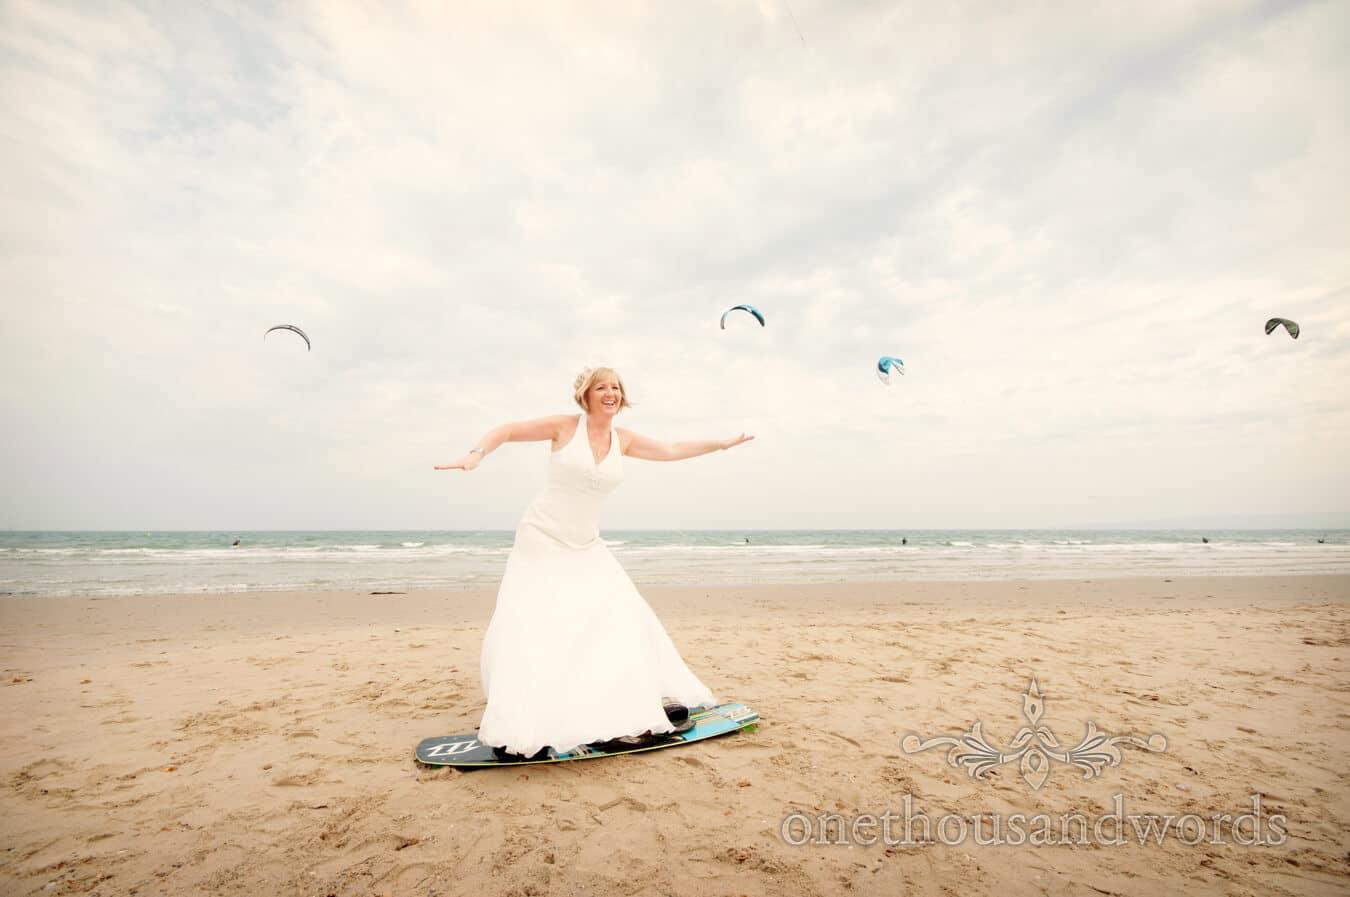 Bride on kiteboard at beach theme wedding in Dorset